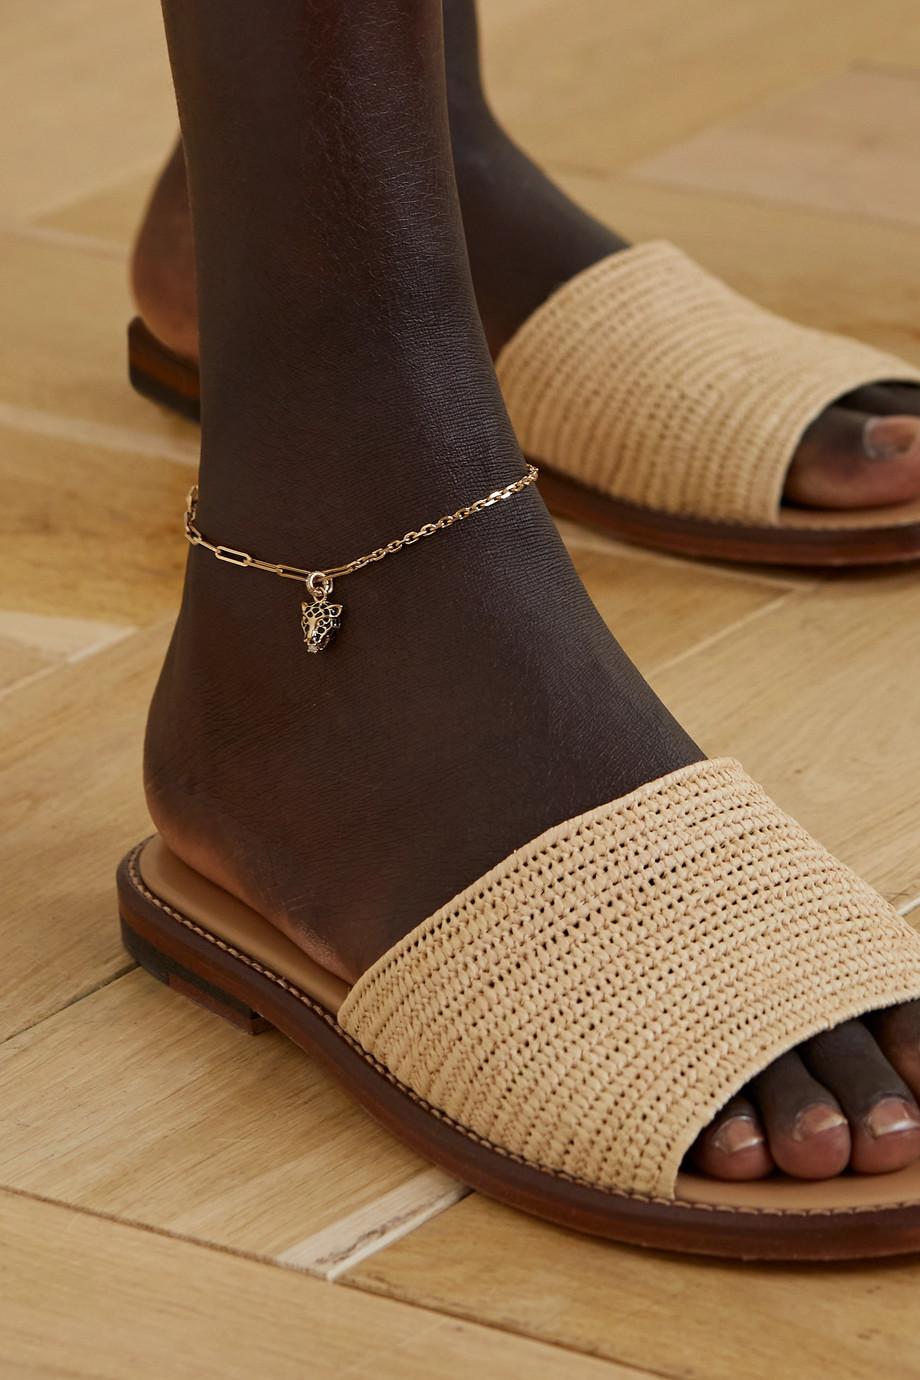 Yvonne Léon 18-karat gold, enamel, spinel and diamond anklet